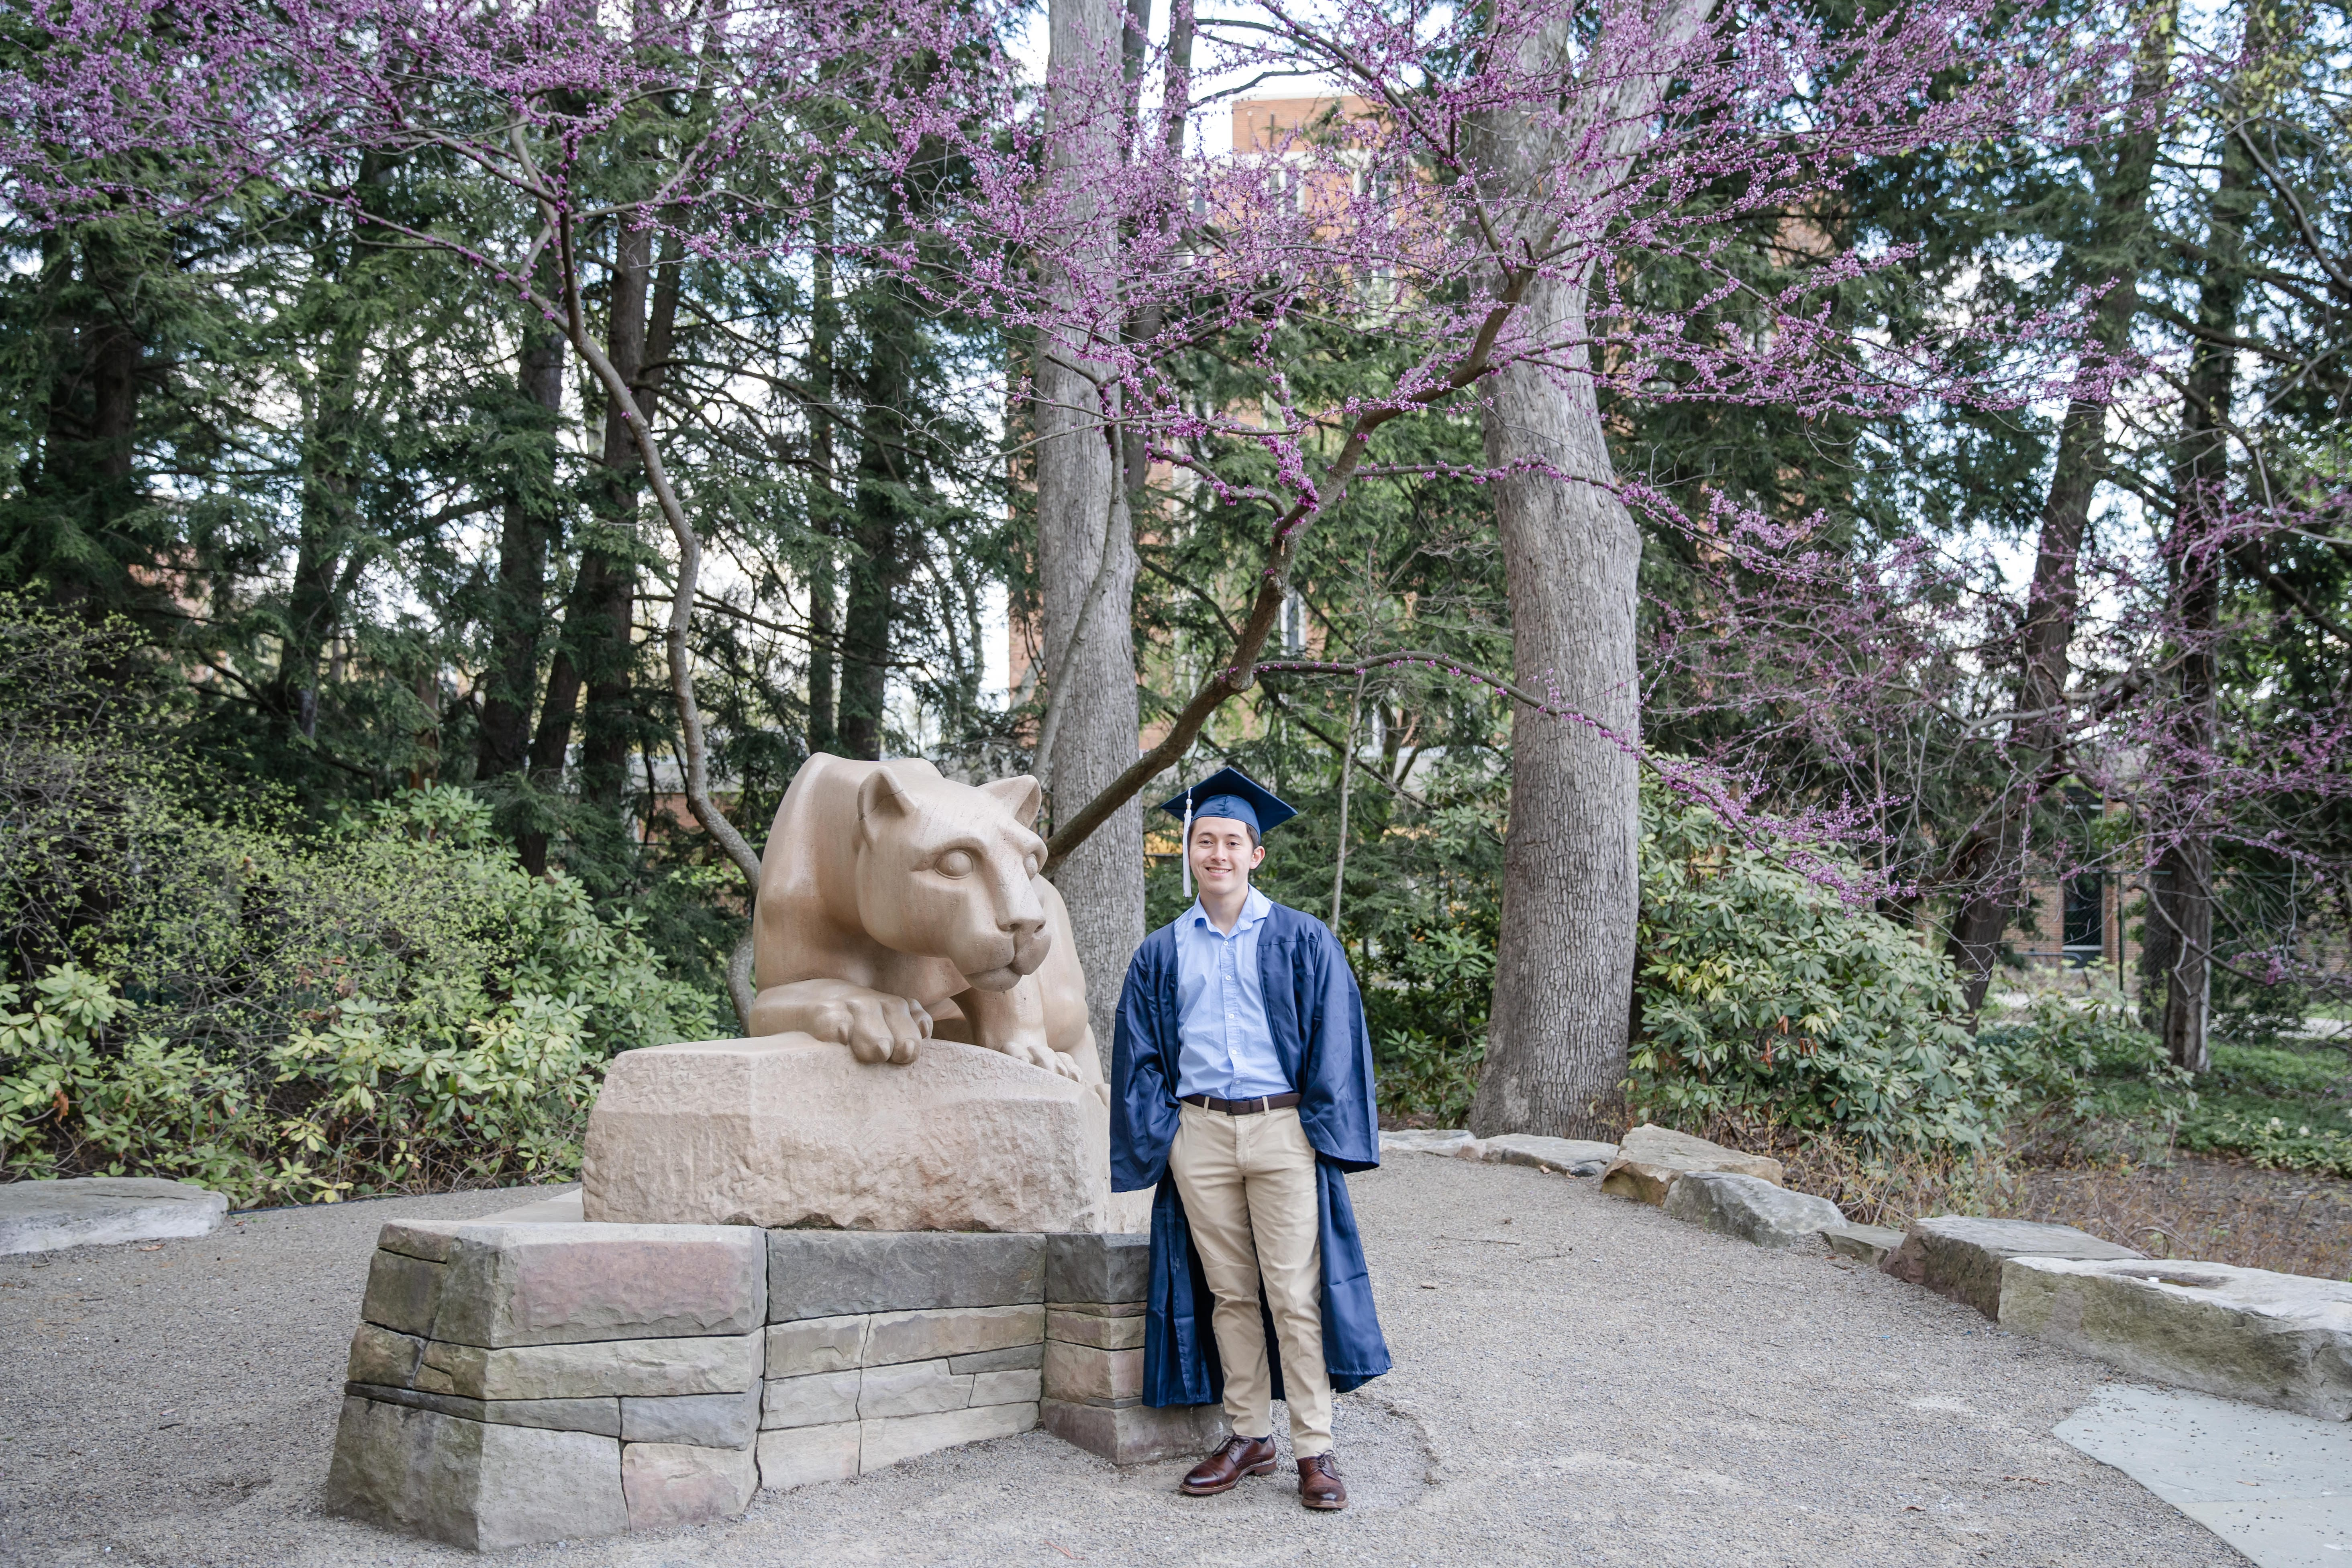 Class of 2020 graduate at Penn State lion shrine